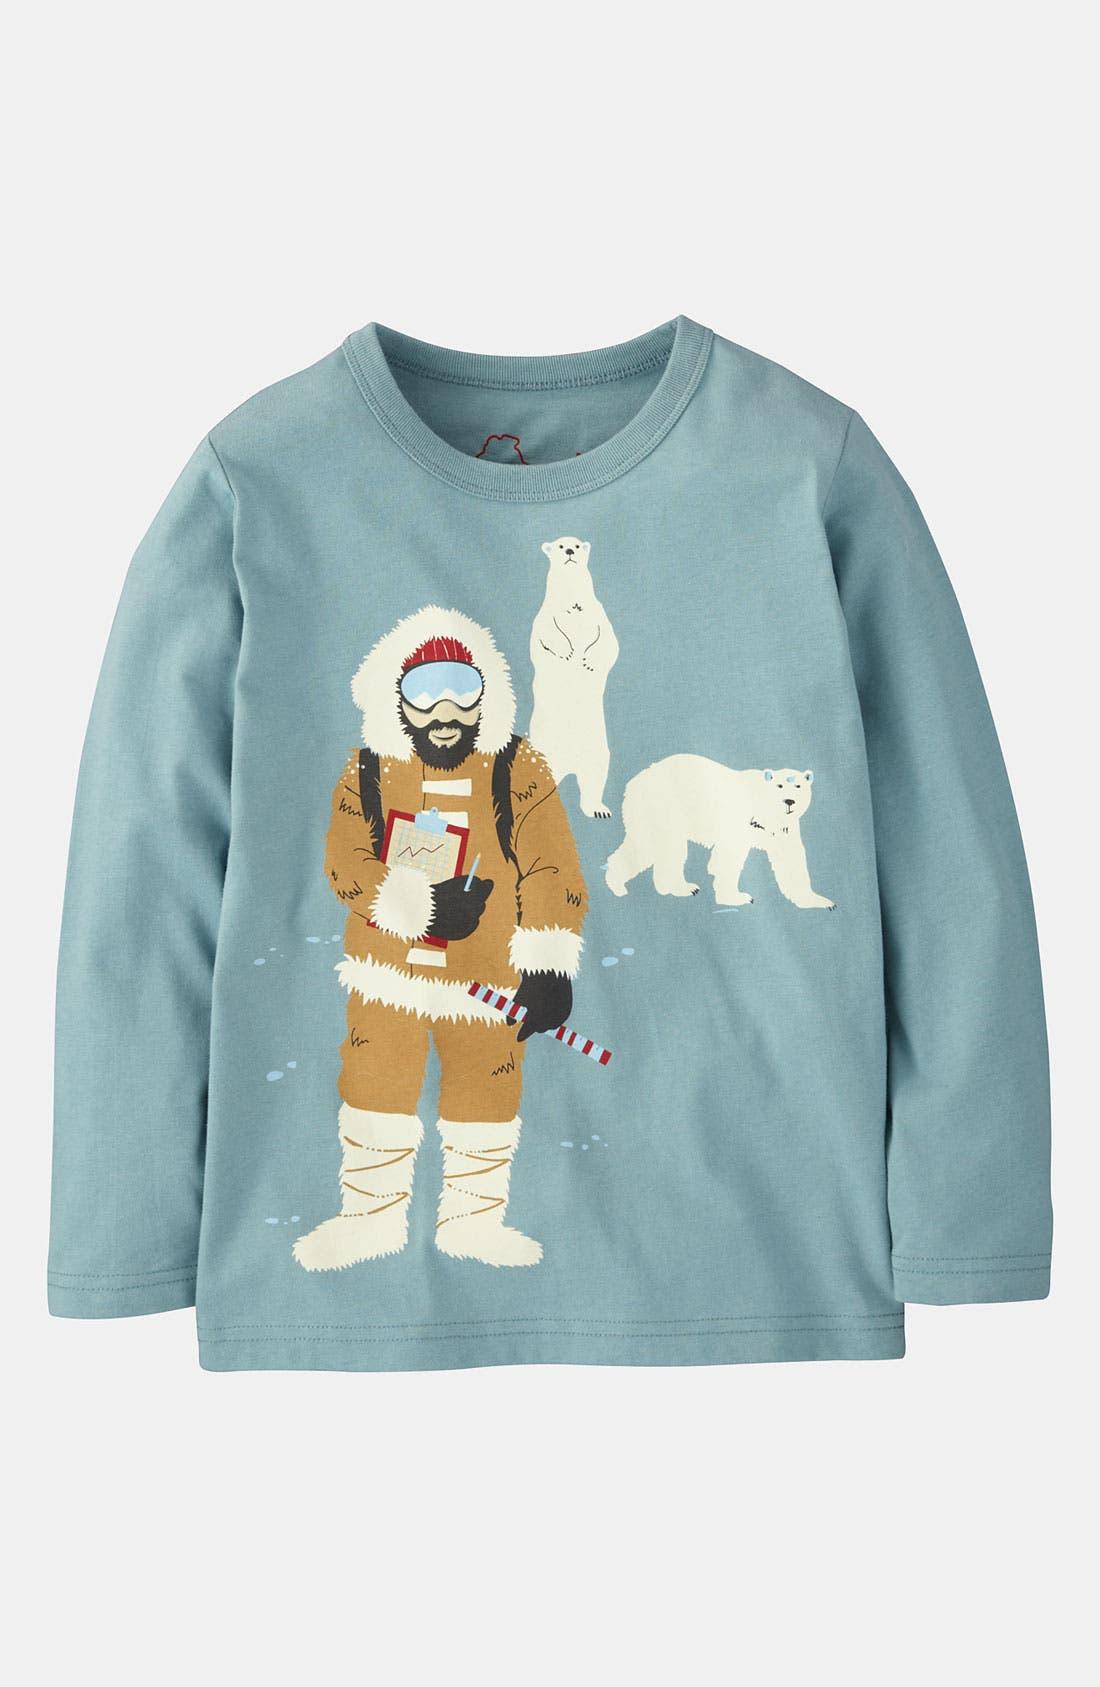 Alternate Image 1 Selected - Mini Boden 'Exploration' T-Shirt (Toddler)